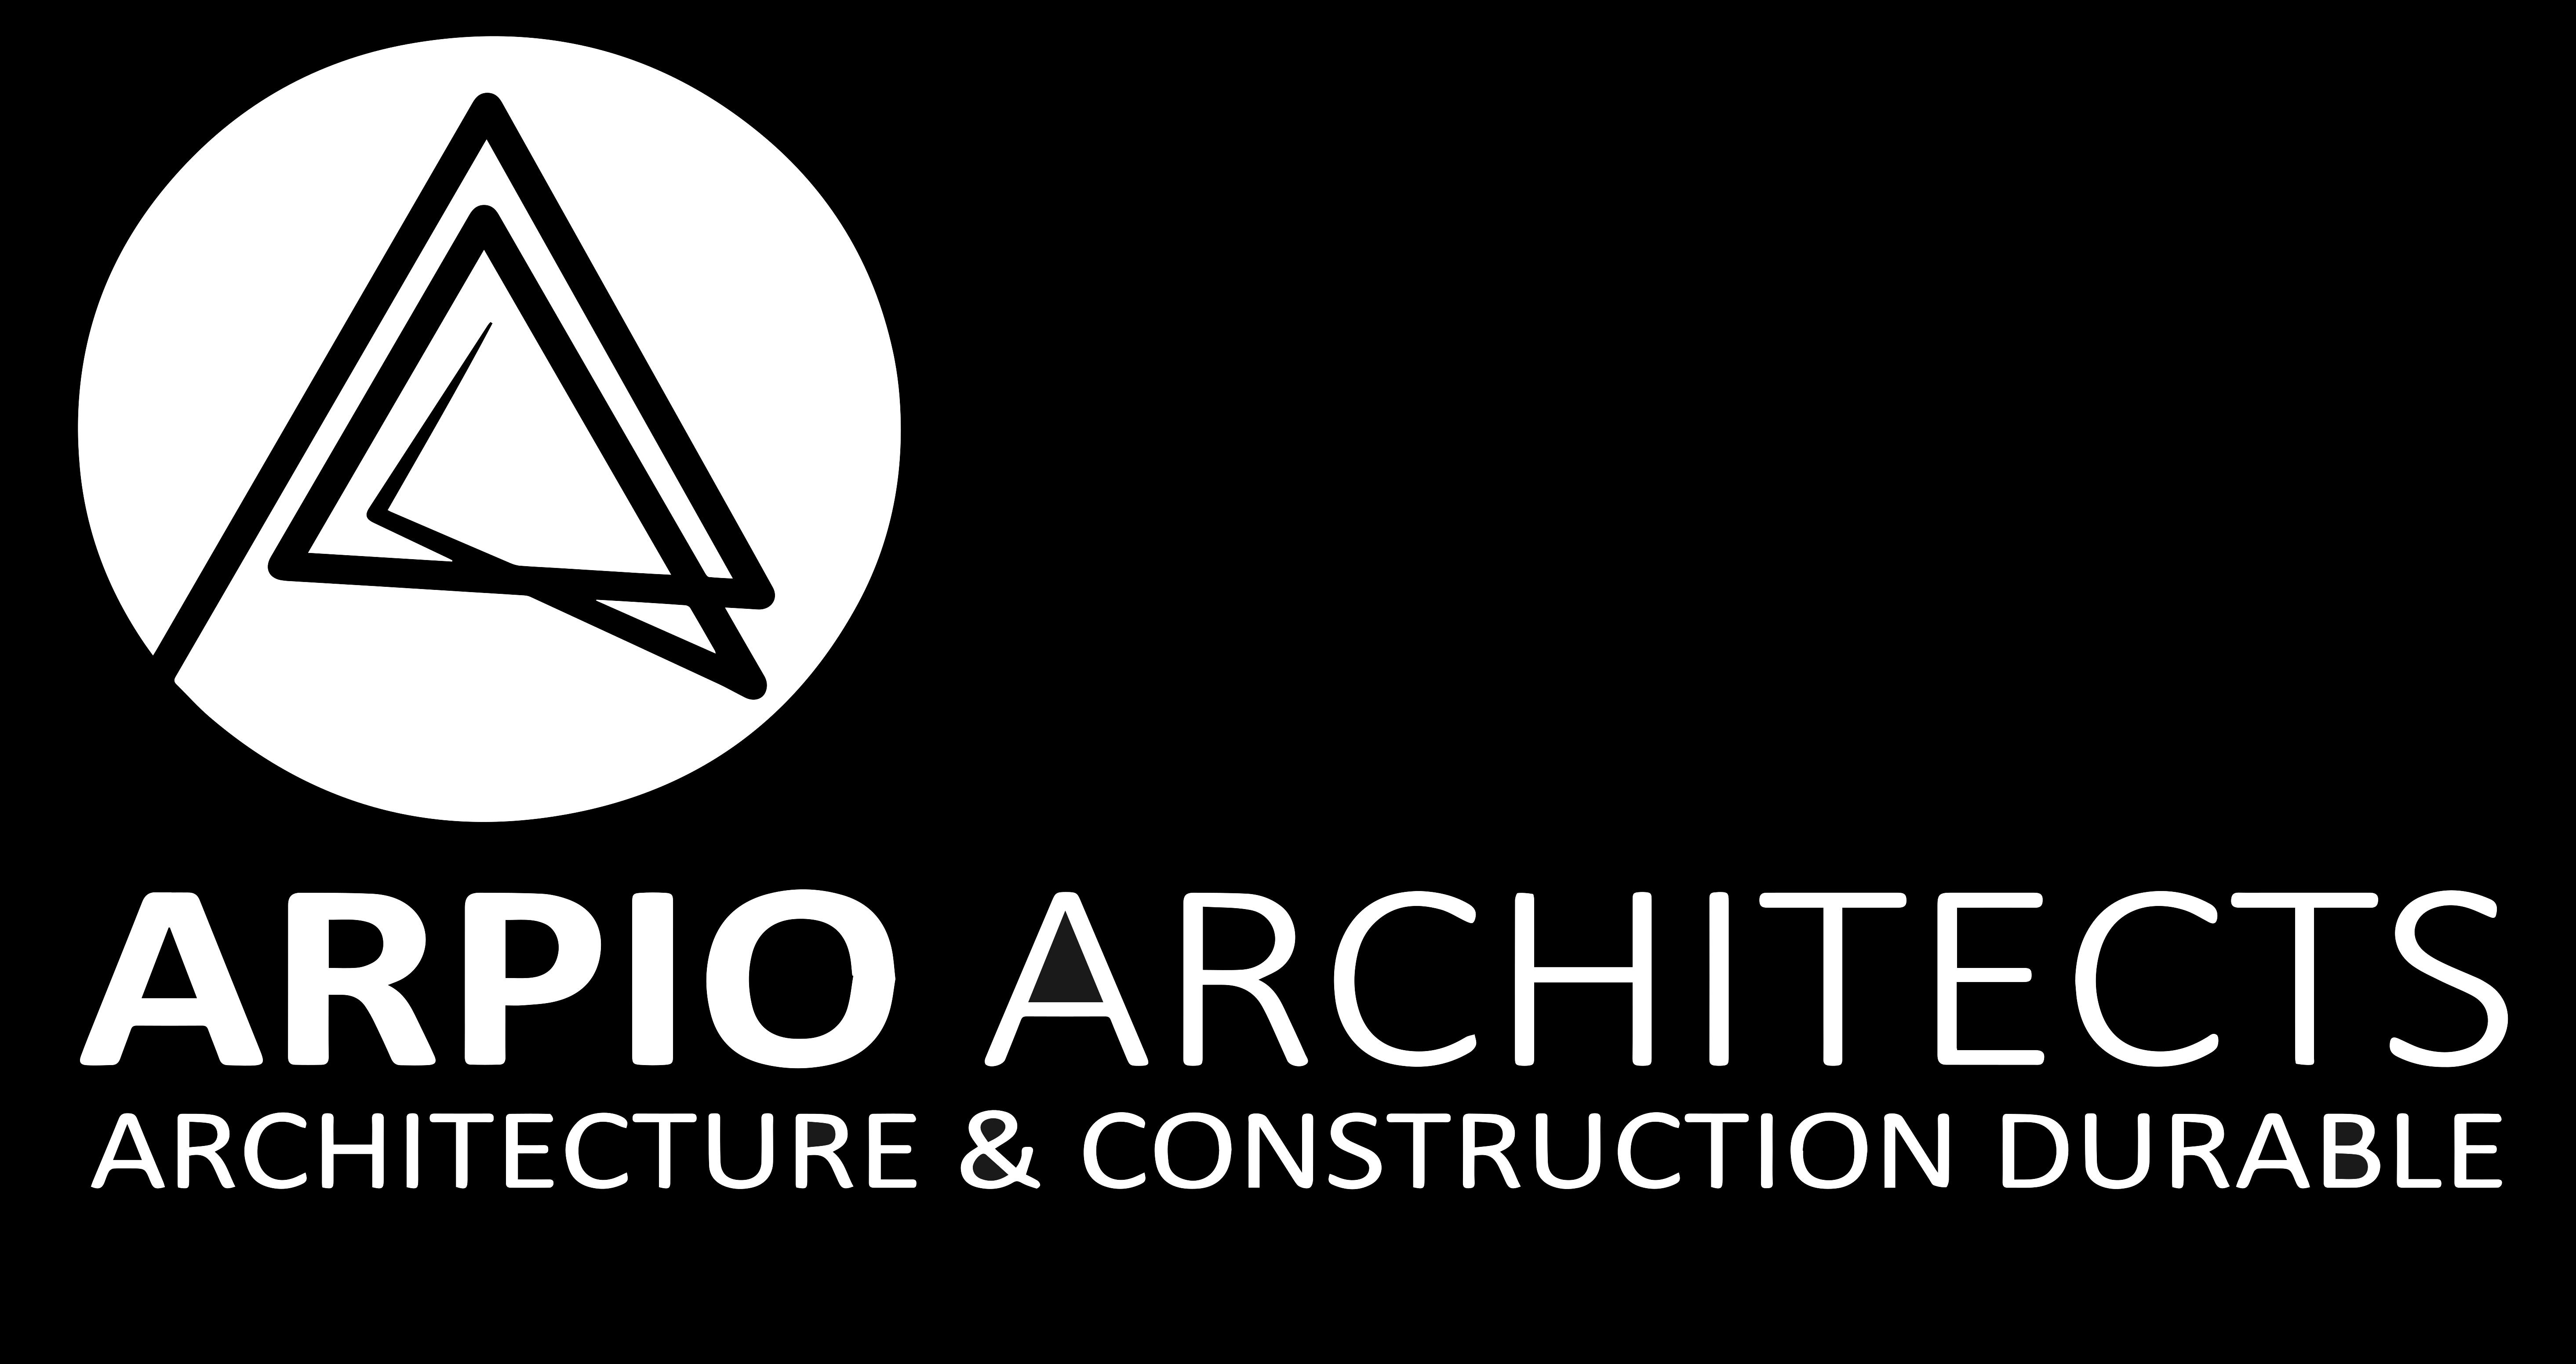 Arpio Architects